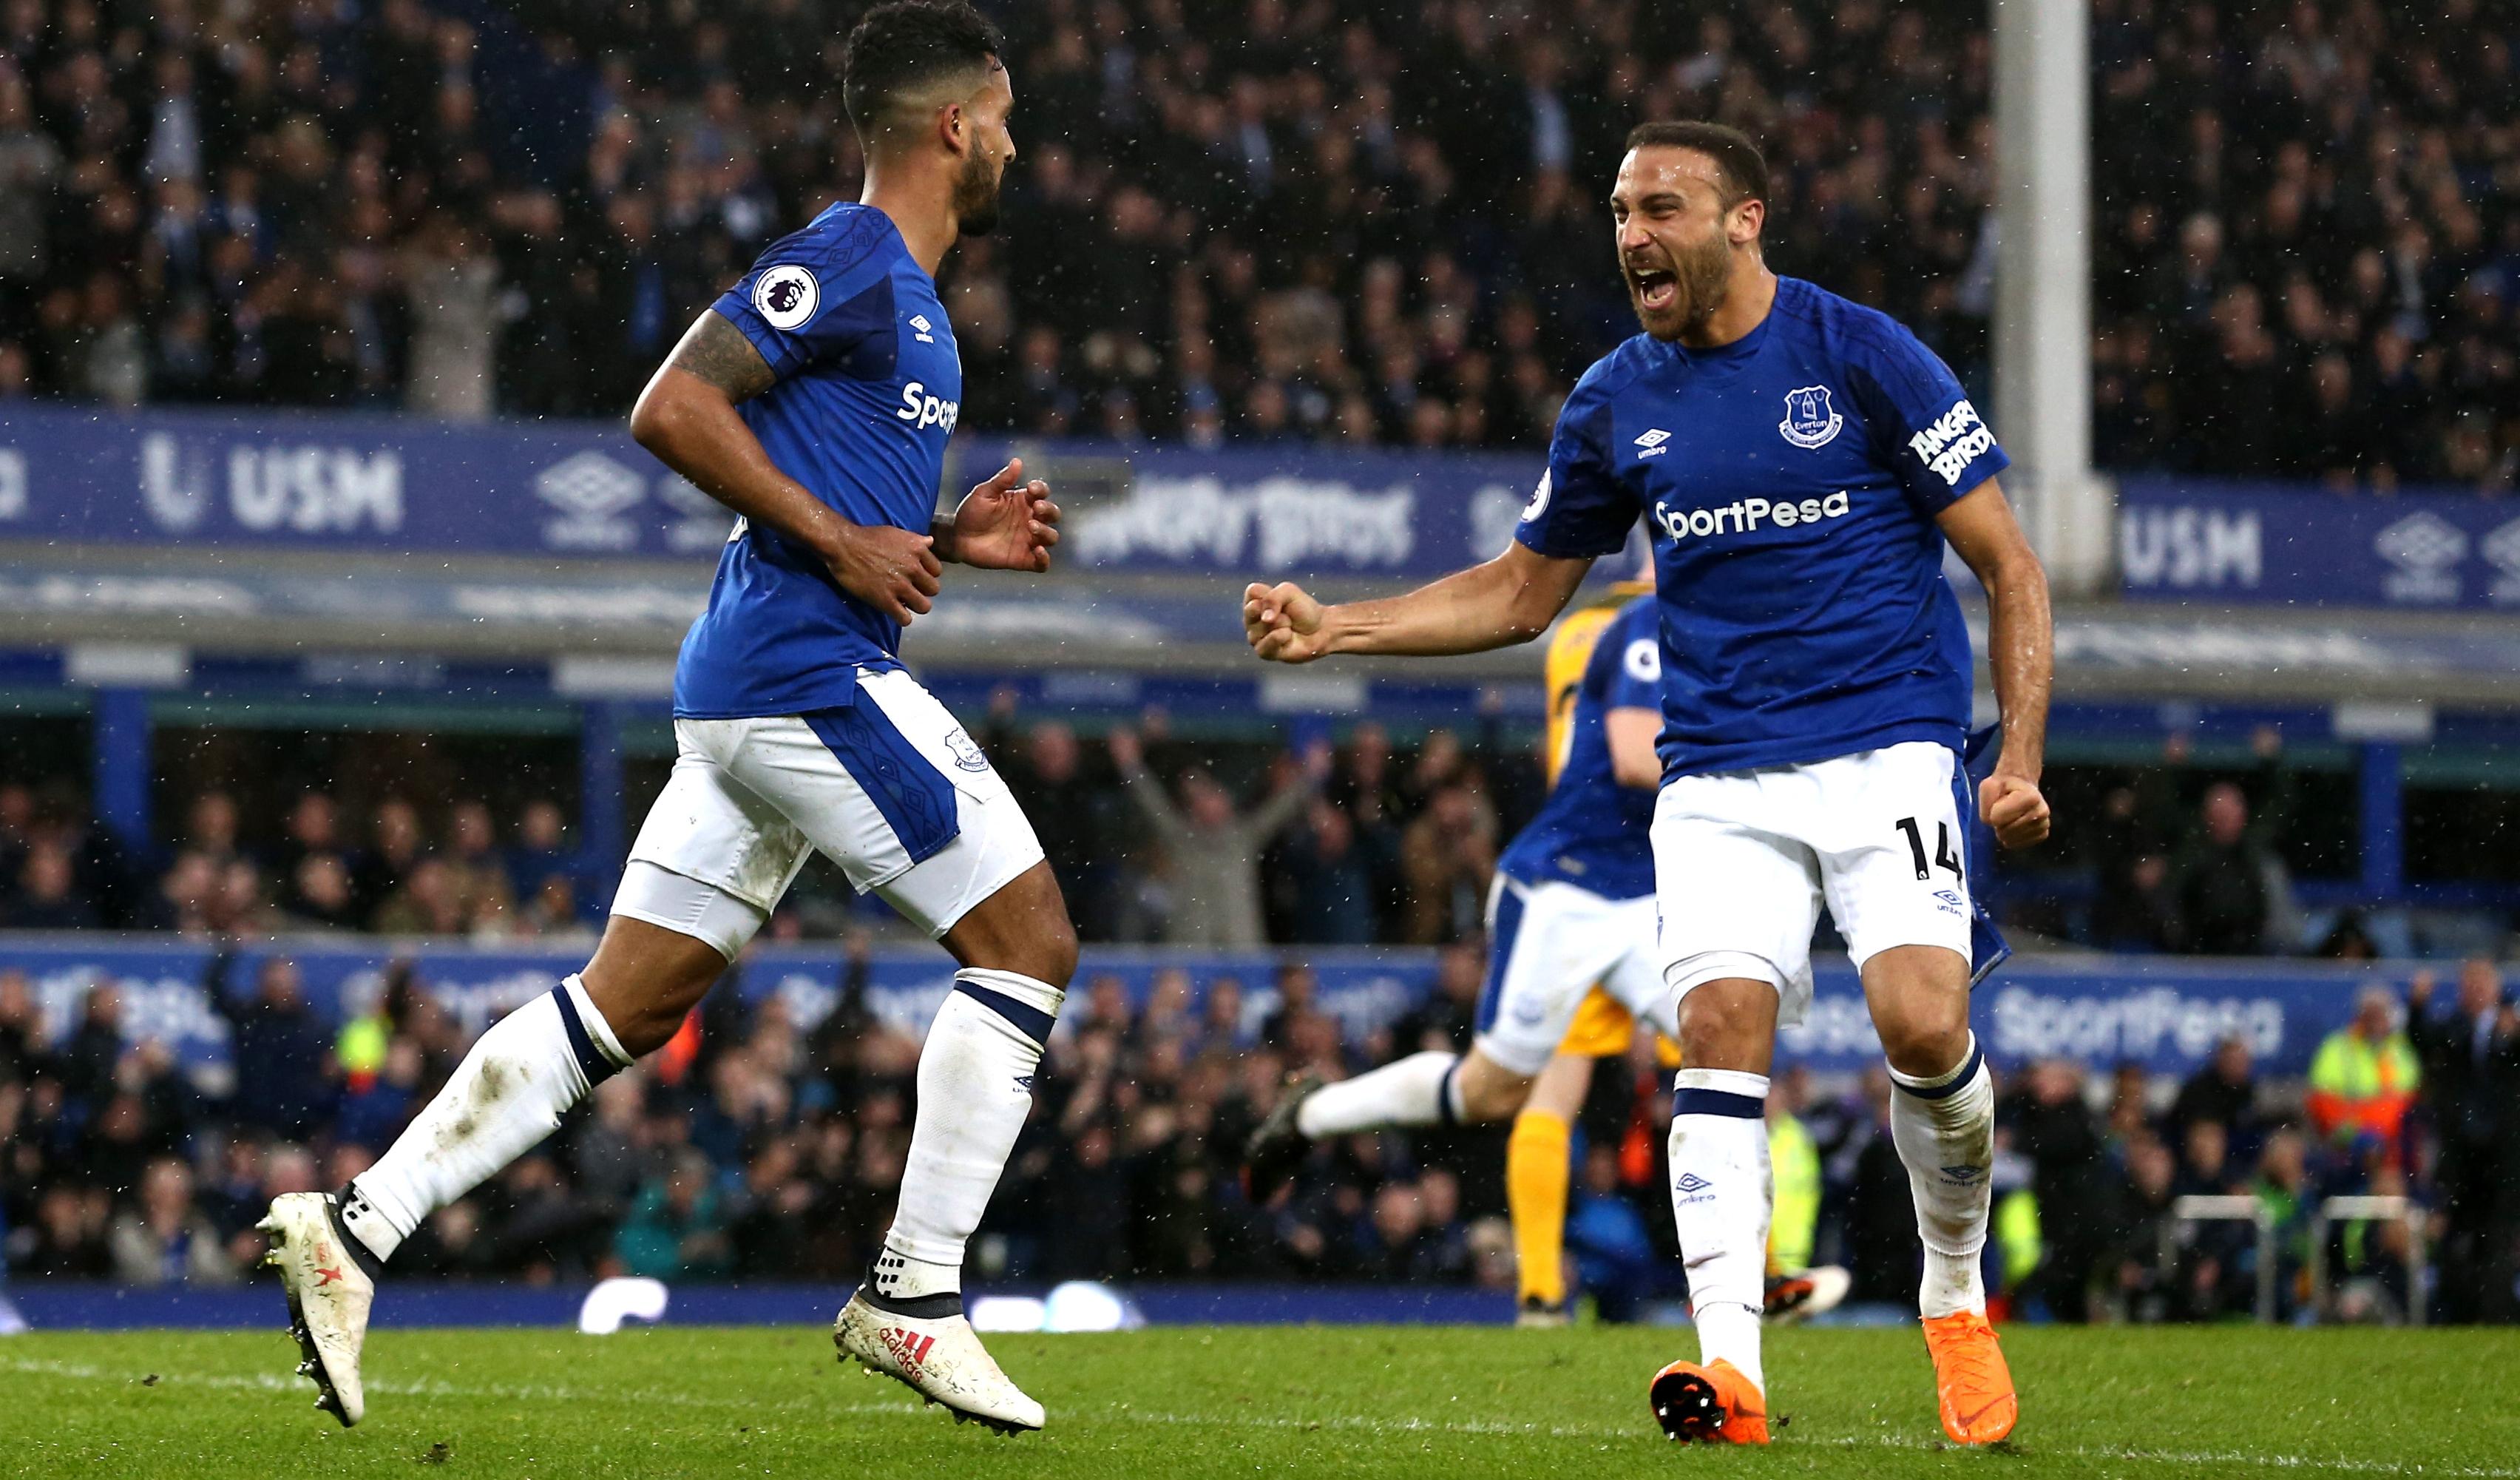 Theo Walcott Cenk Tosun Everton Brighton 03/10/18